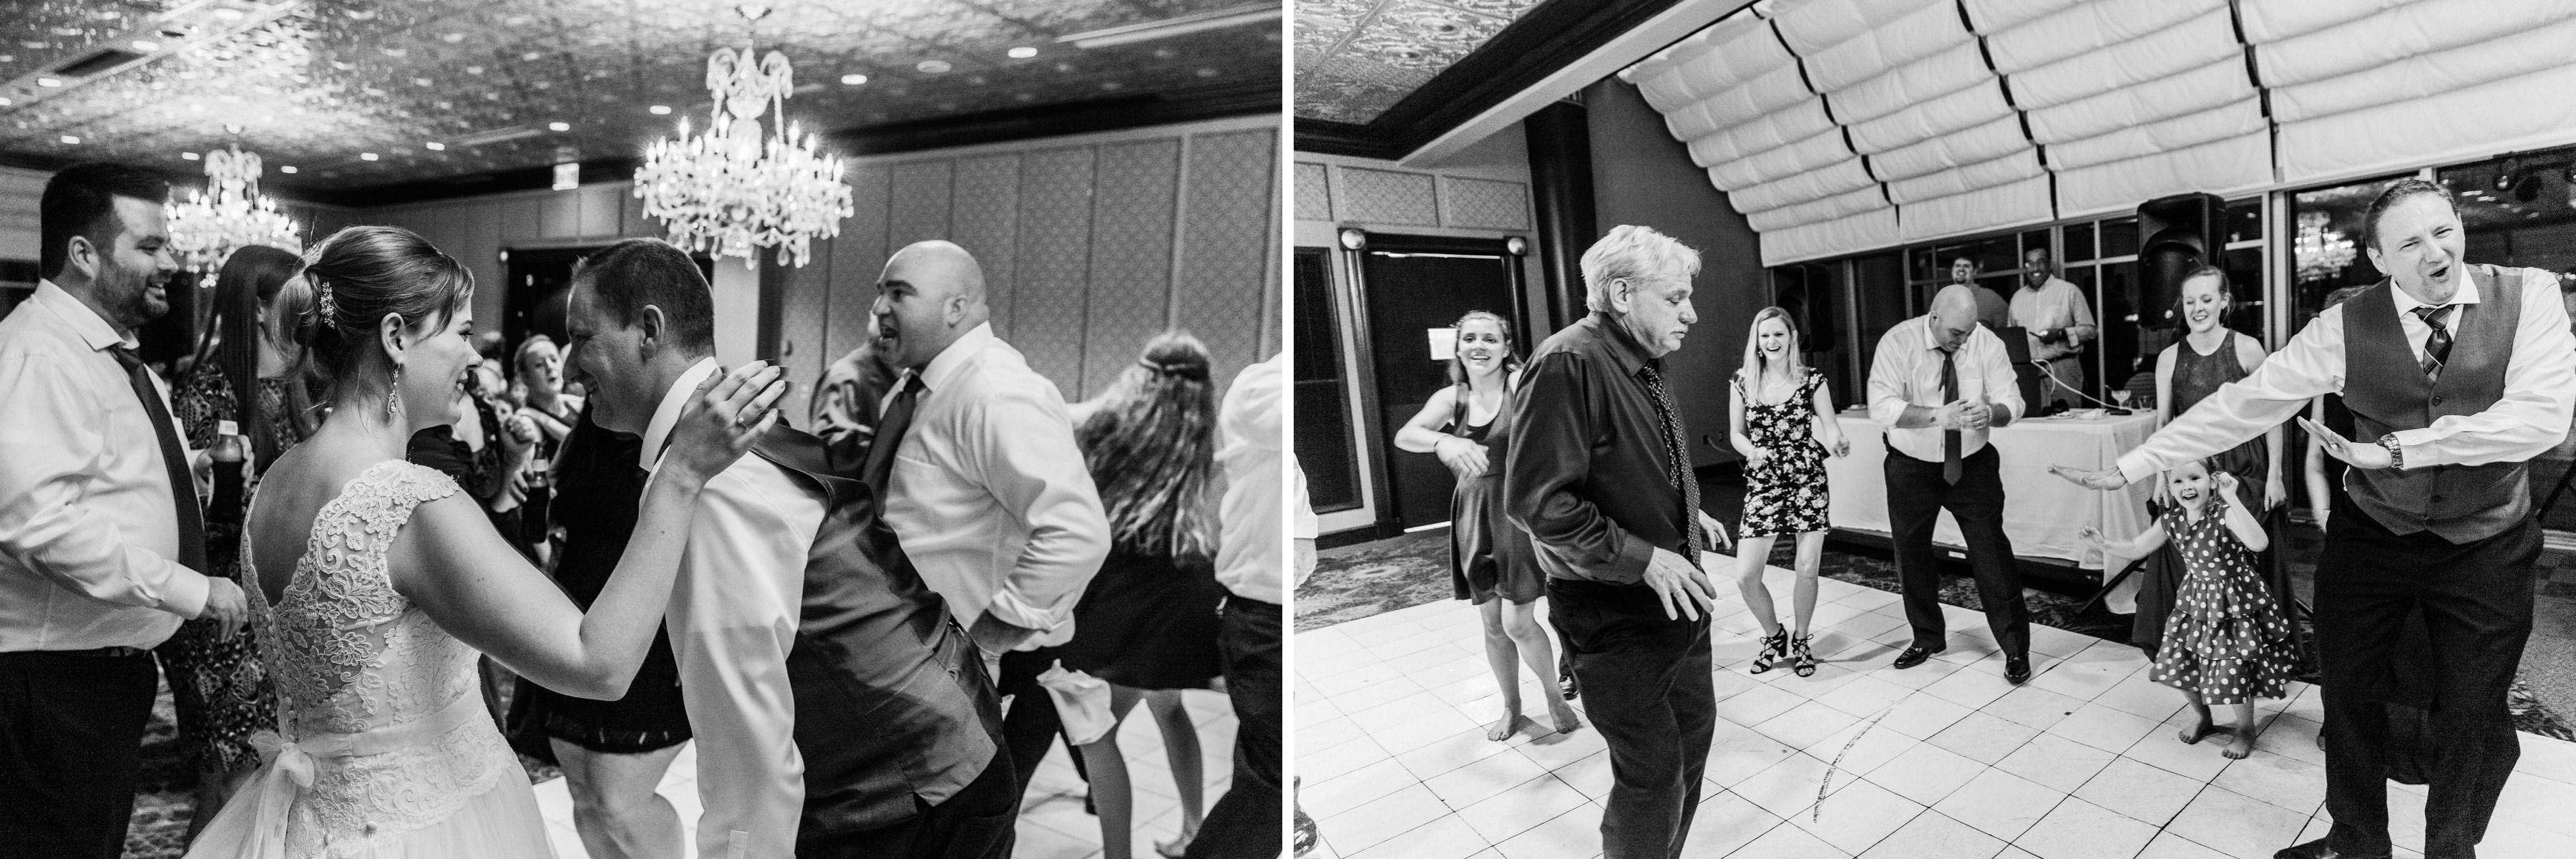 MAULDIN_WEDDING_MONTGOMERY_ALABAMA_WEDDING_PHOTOGRAPHY_131